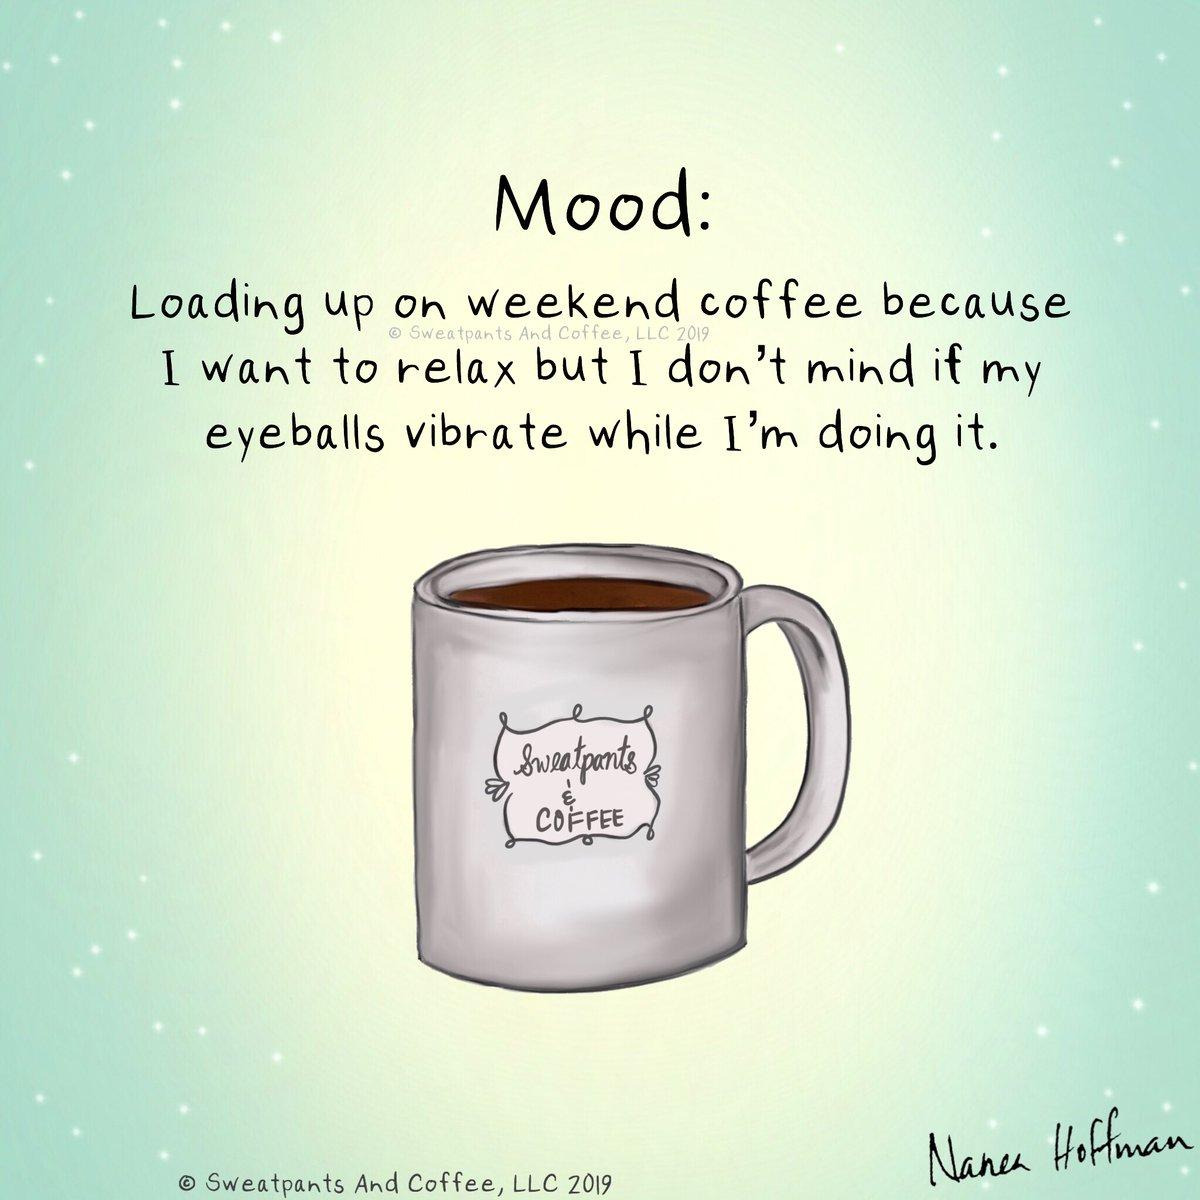 "Sweatpants & Coffee on Twitter: ""Happy weekend! #coffee ... #sweatpantsCoffeeQuotes"